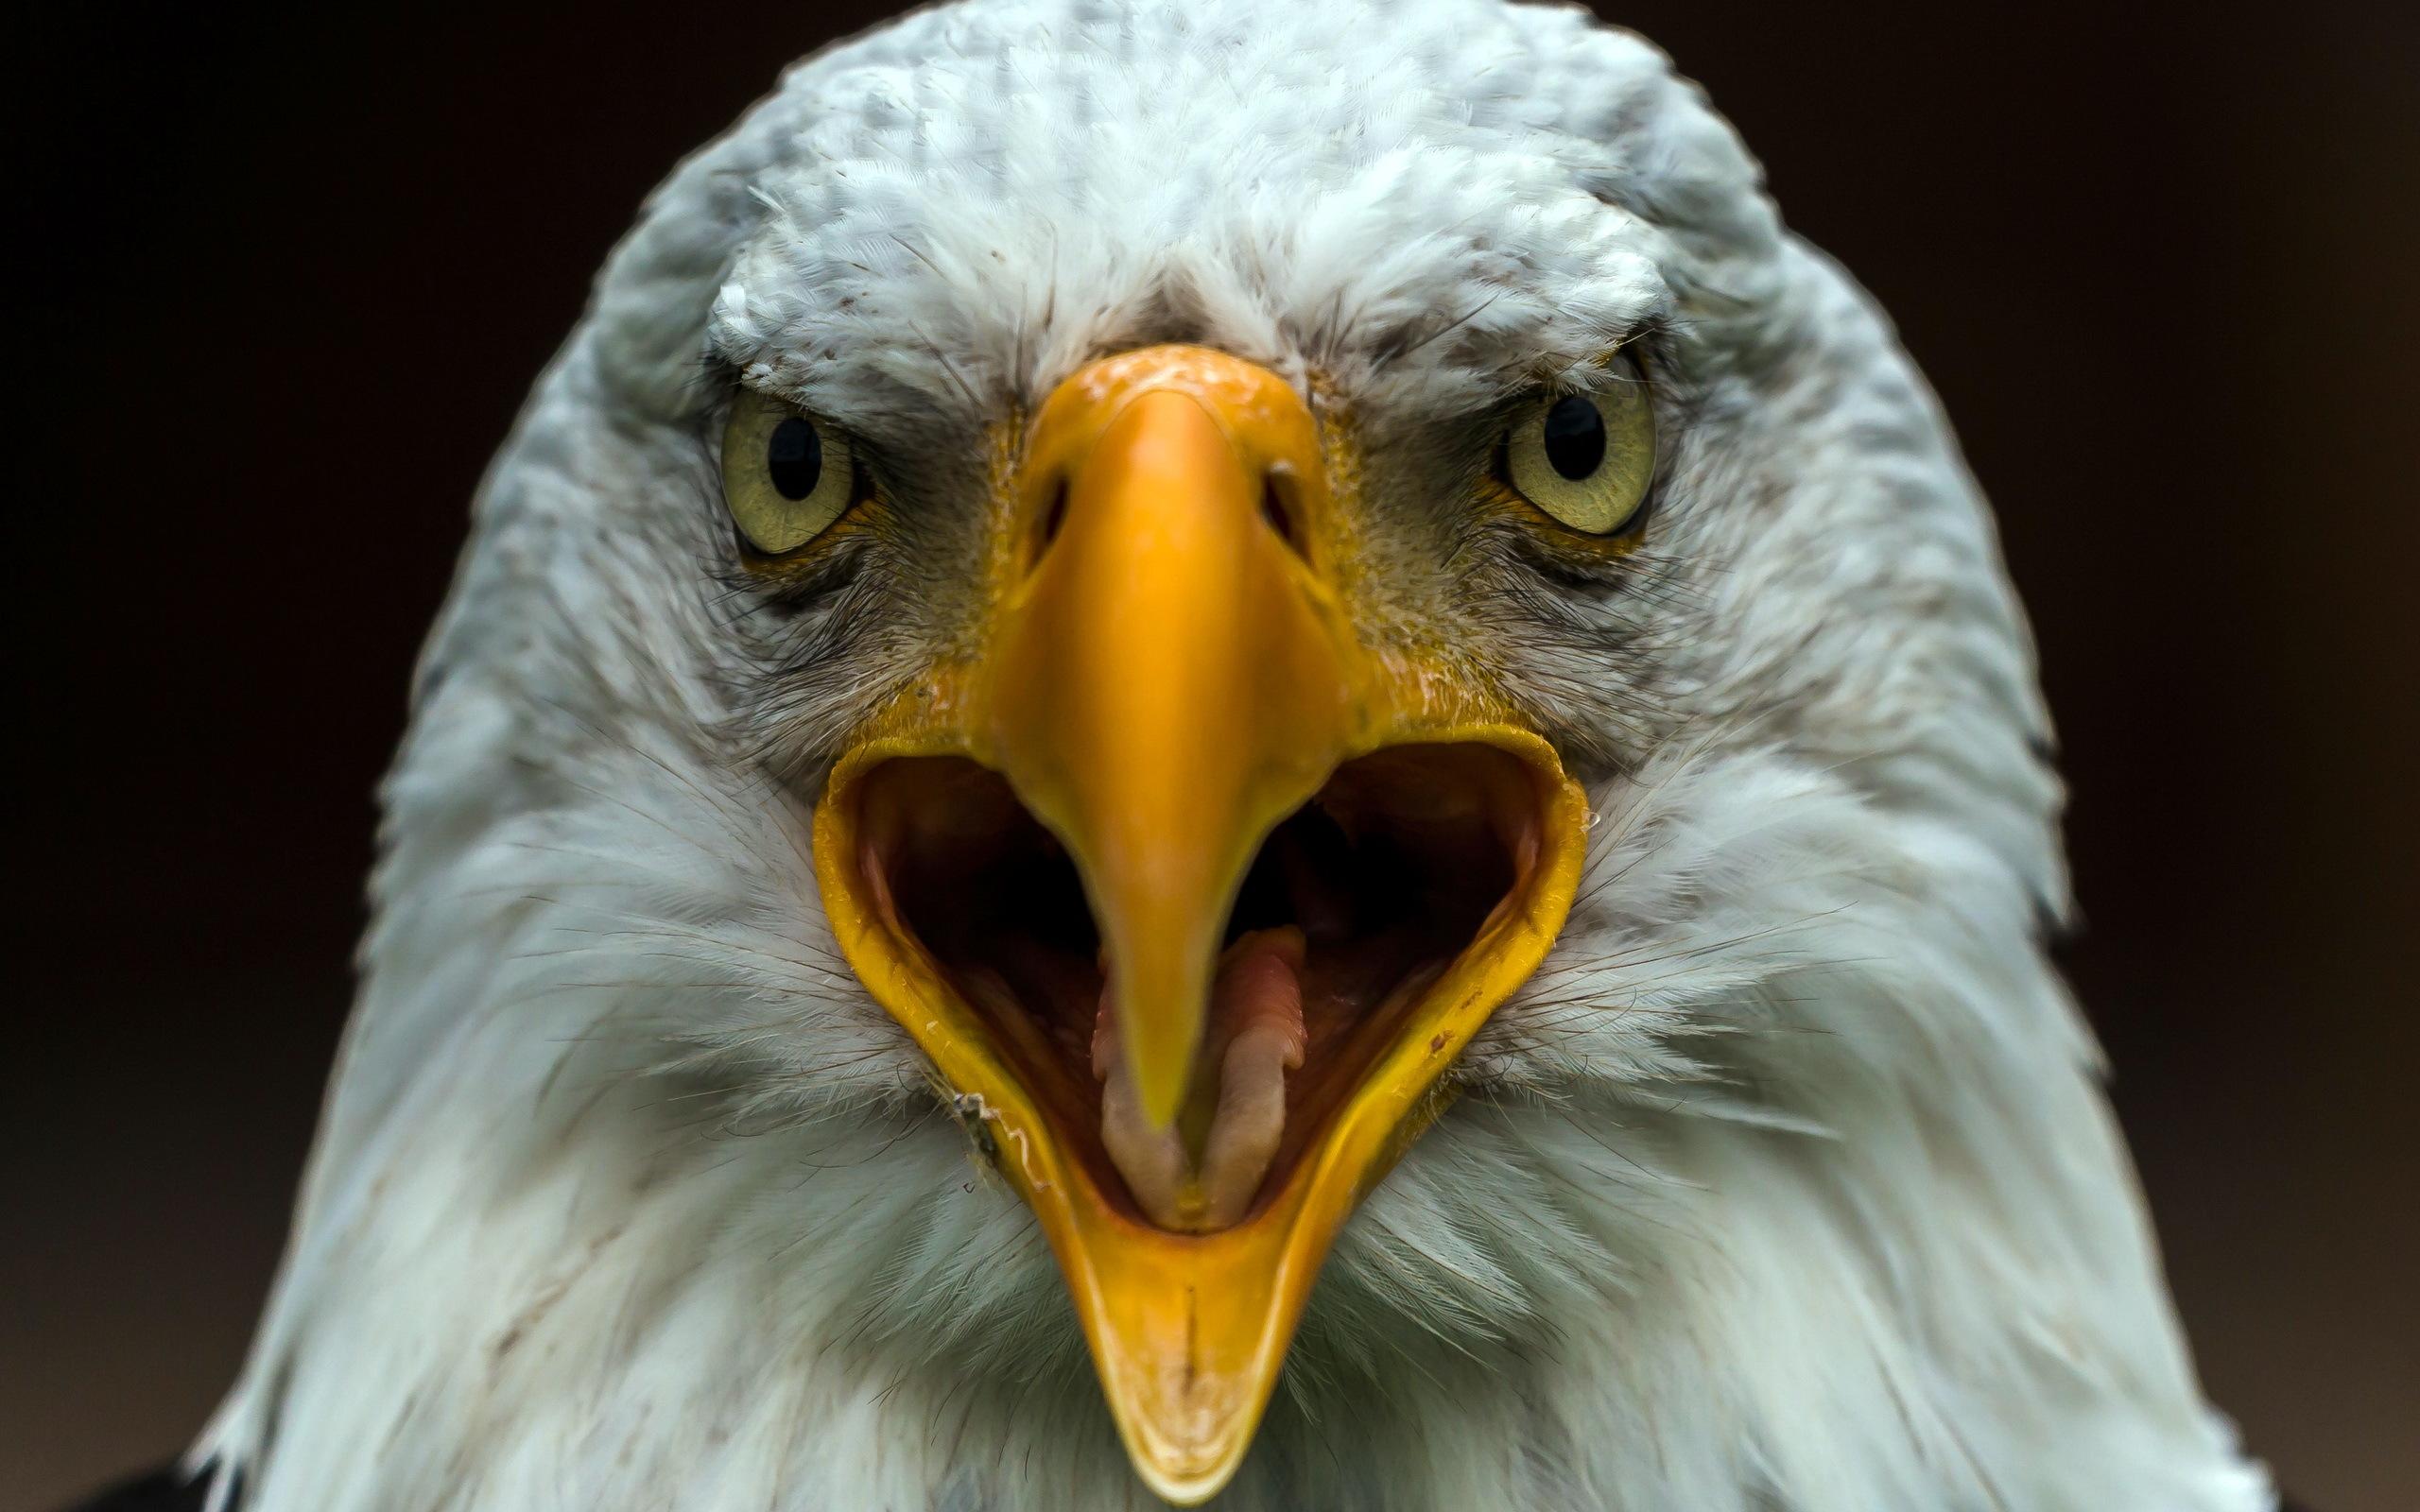 66+ Bald Eagle Desktop Wallpaper on WallpaperSafari